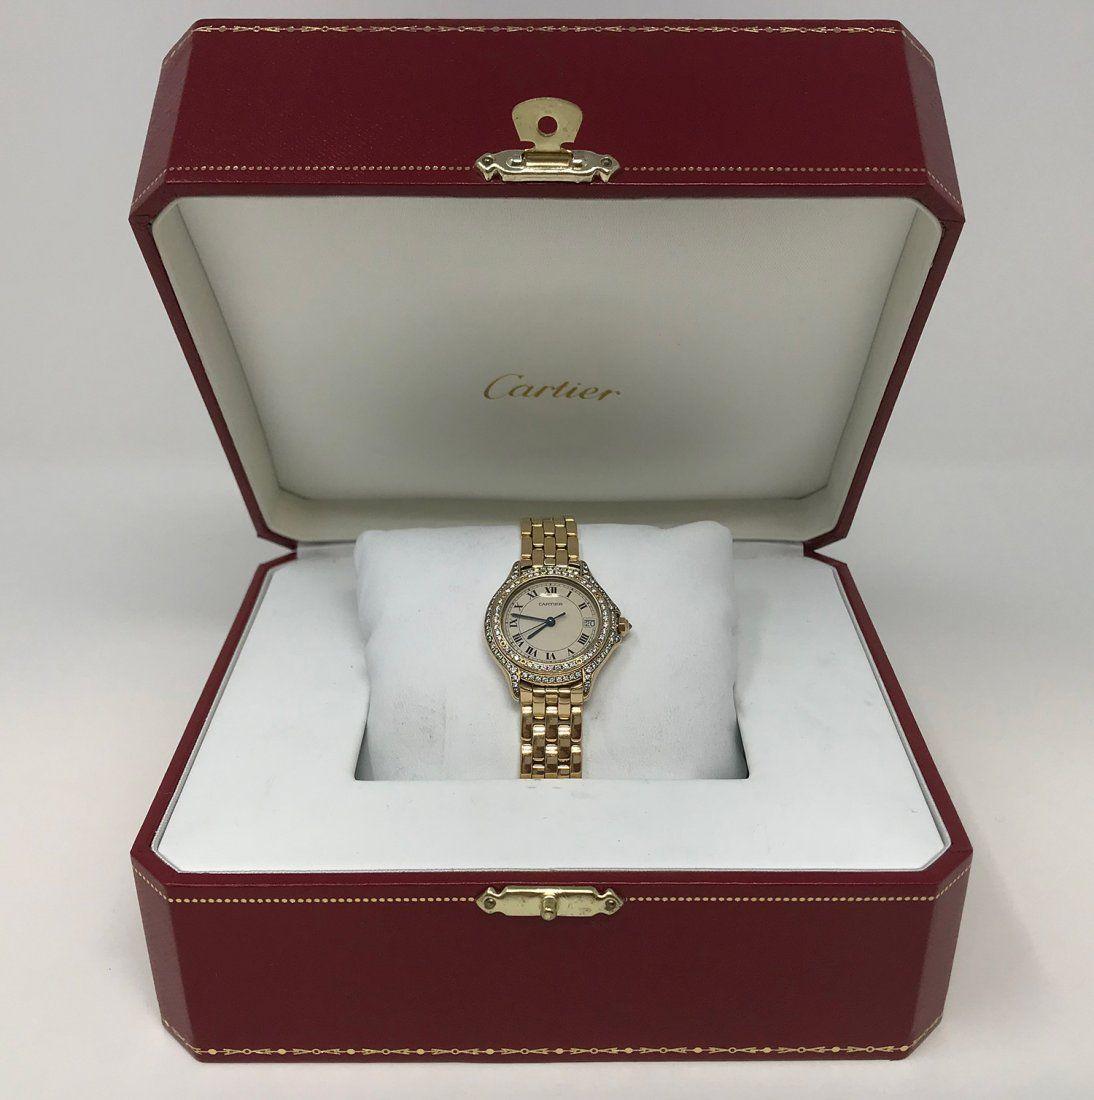 Cartier Cougar Panthere 18k Gold Diamond & Ladies Watch